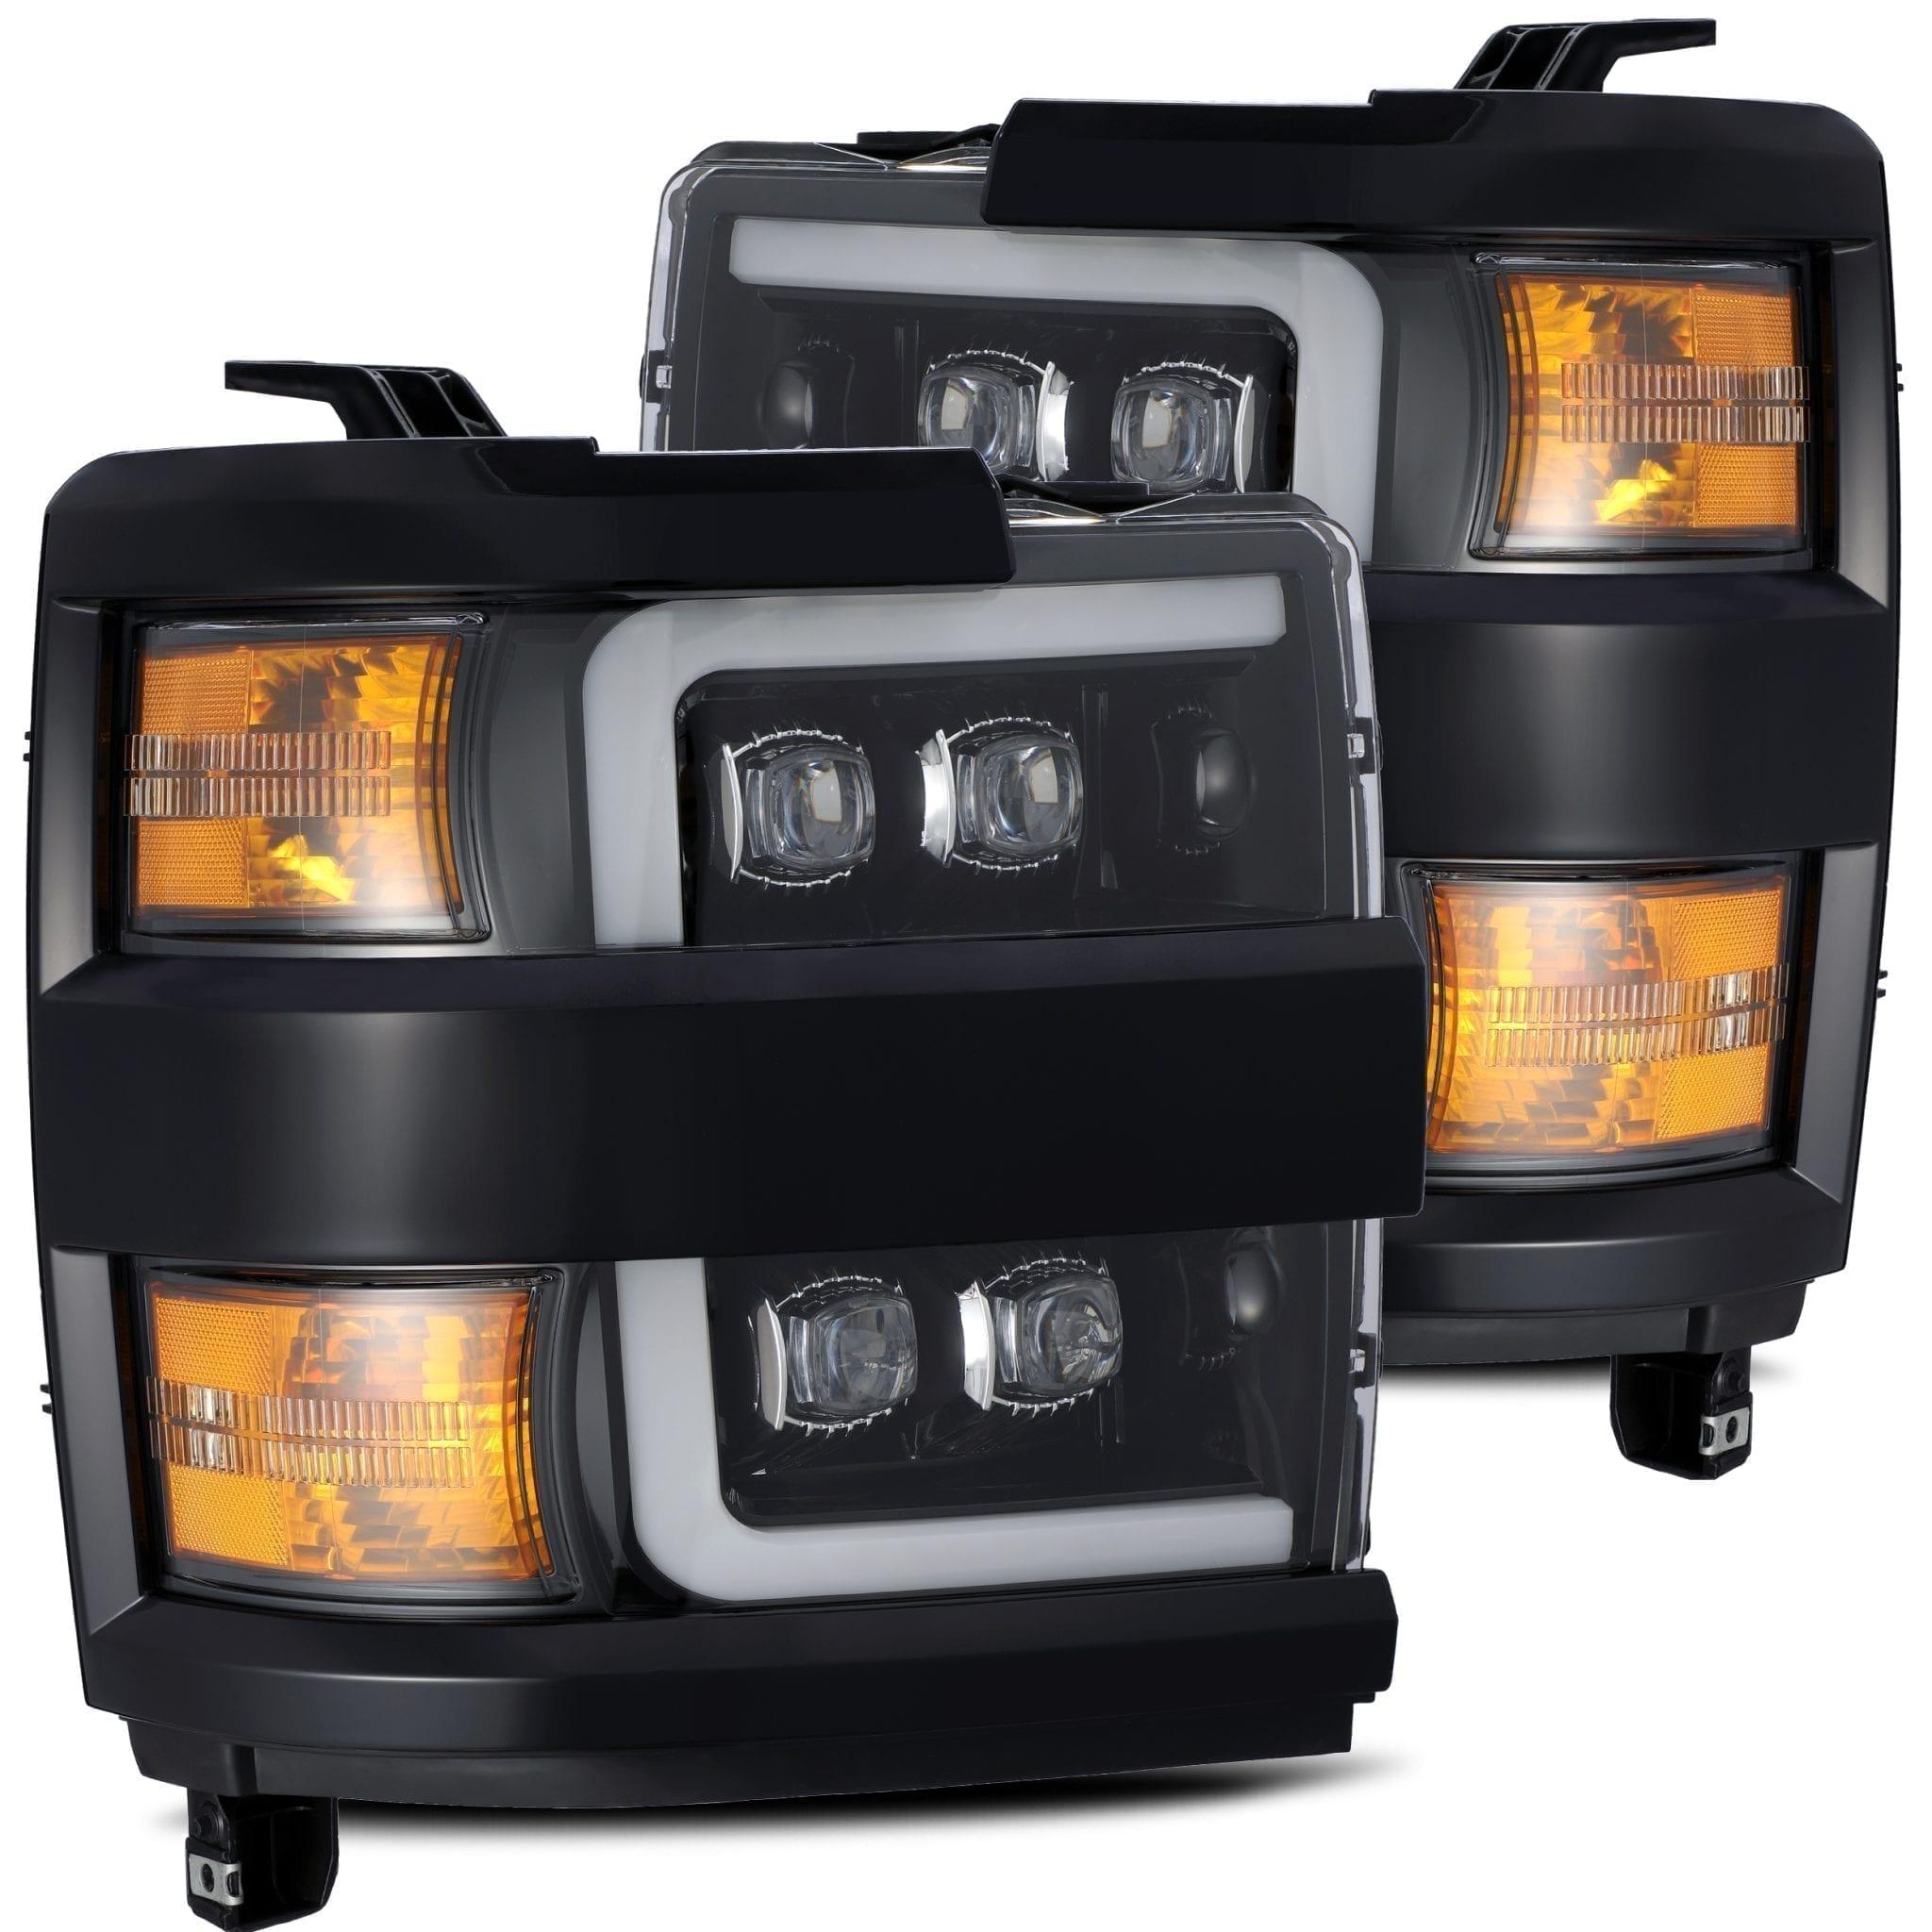 2015 2016 2017 2018 2019 Chevrolet Silverado 2500HD 3500HD NOVA-Series Full LED Projector Headlights Jet Black